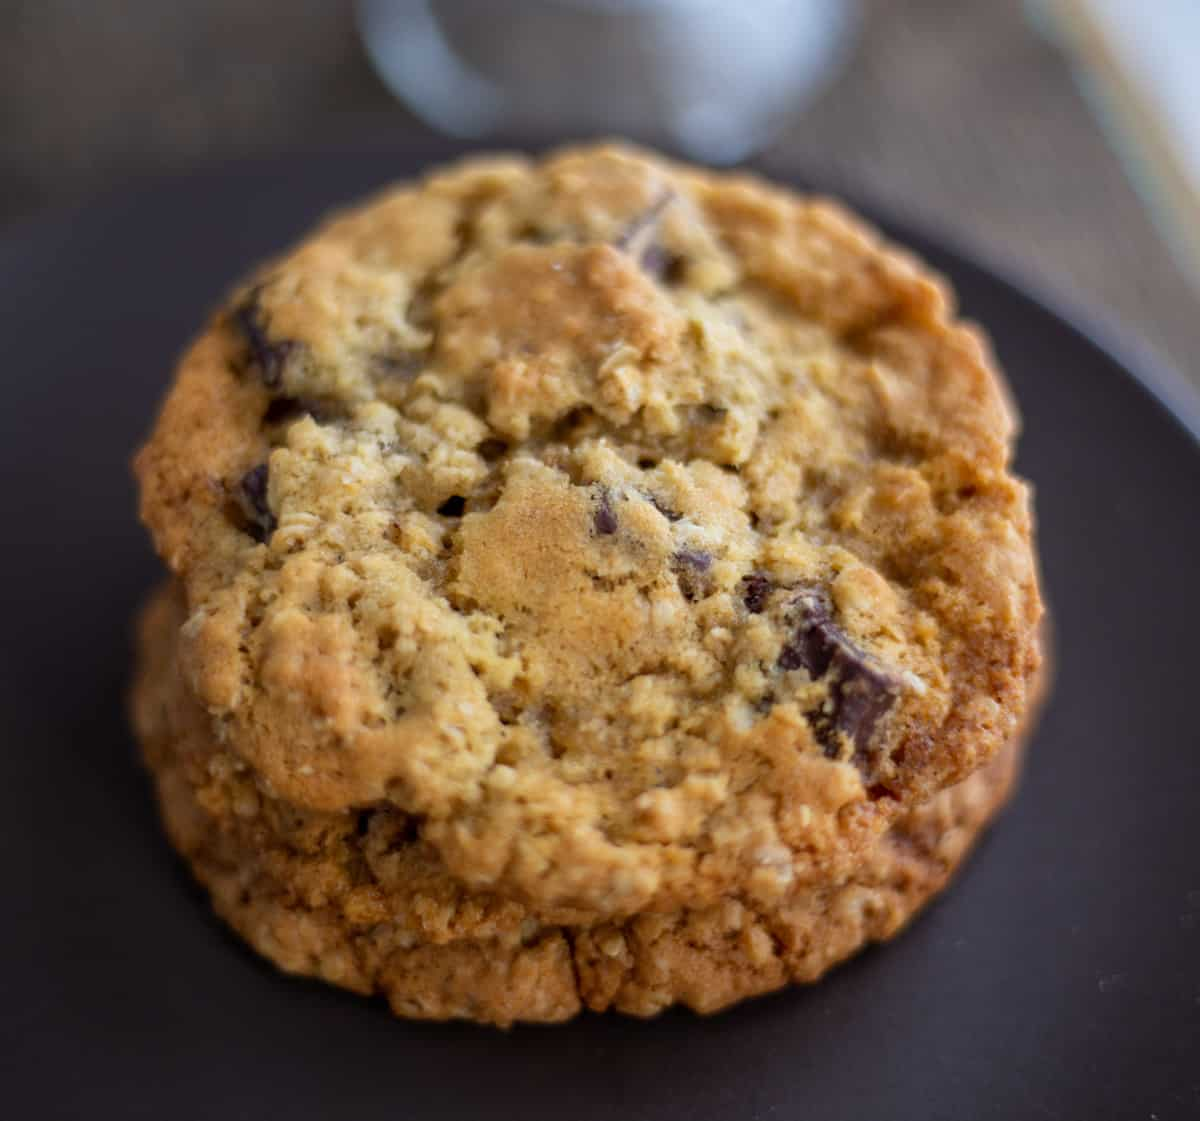 Oatmeal chocolate chunk cookie on brown plate.